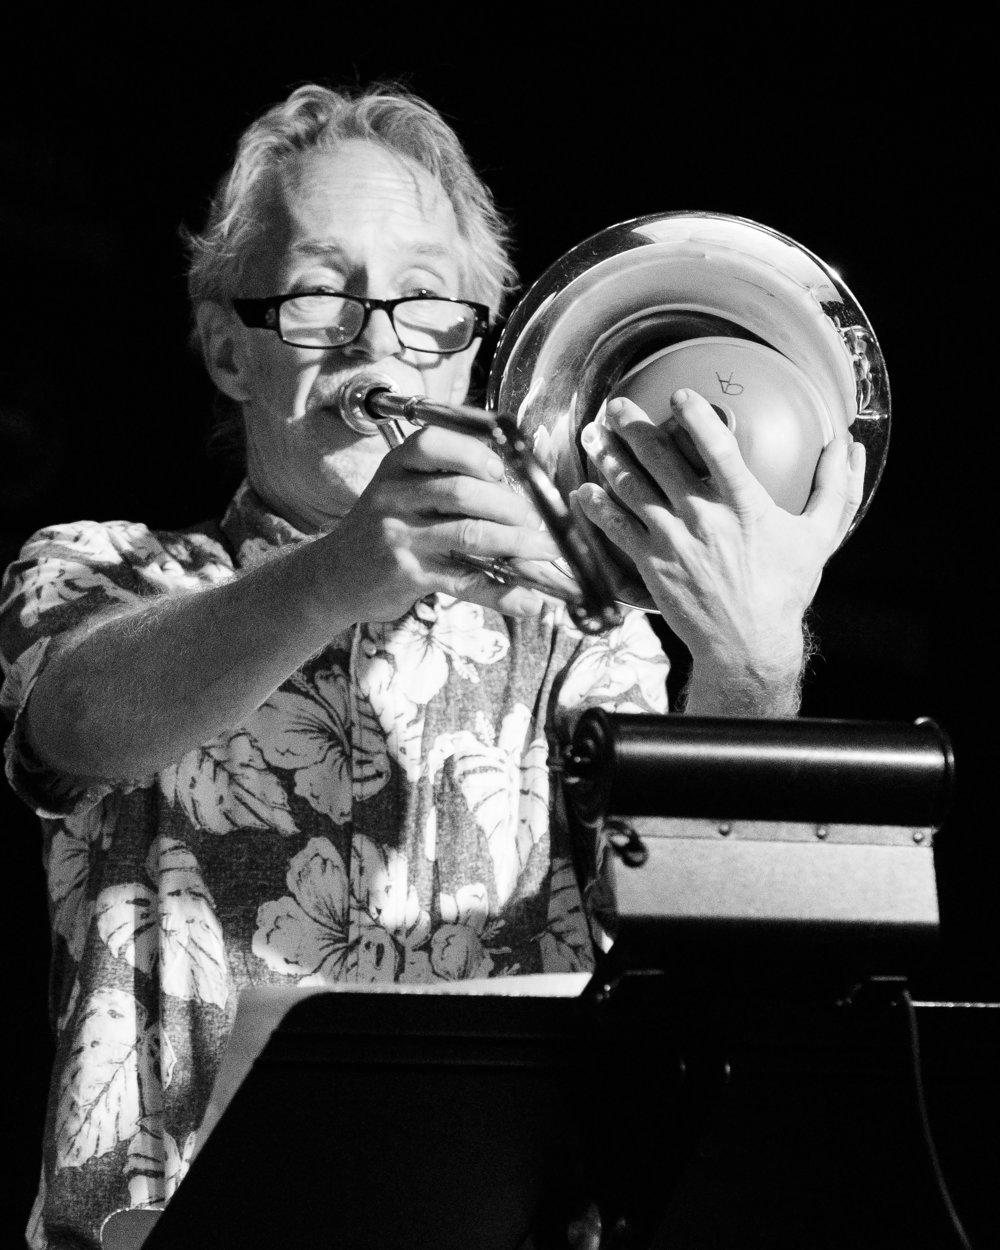 Phil Arnold Trombone